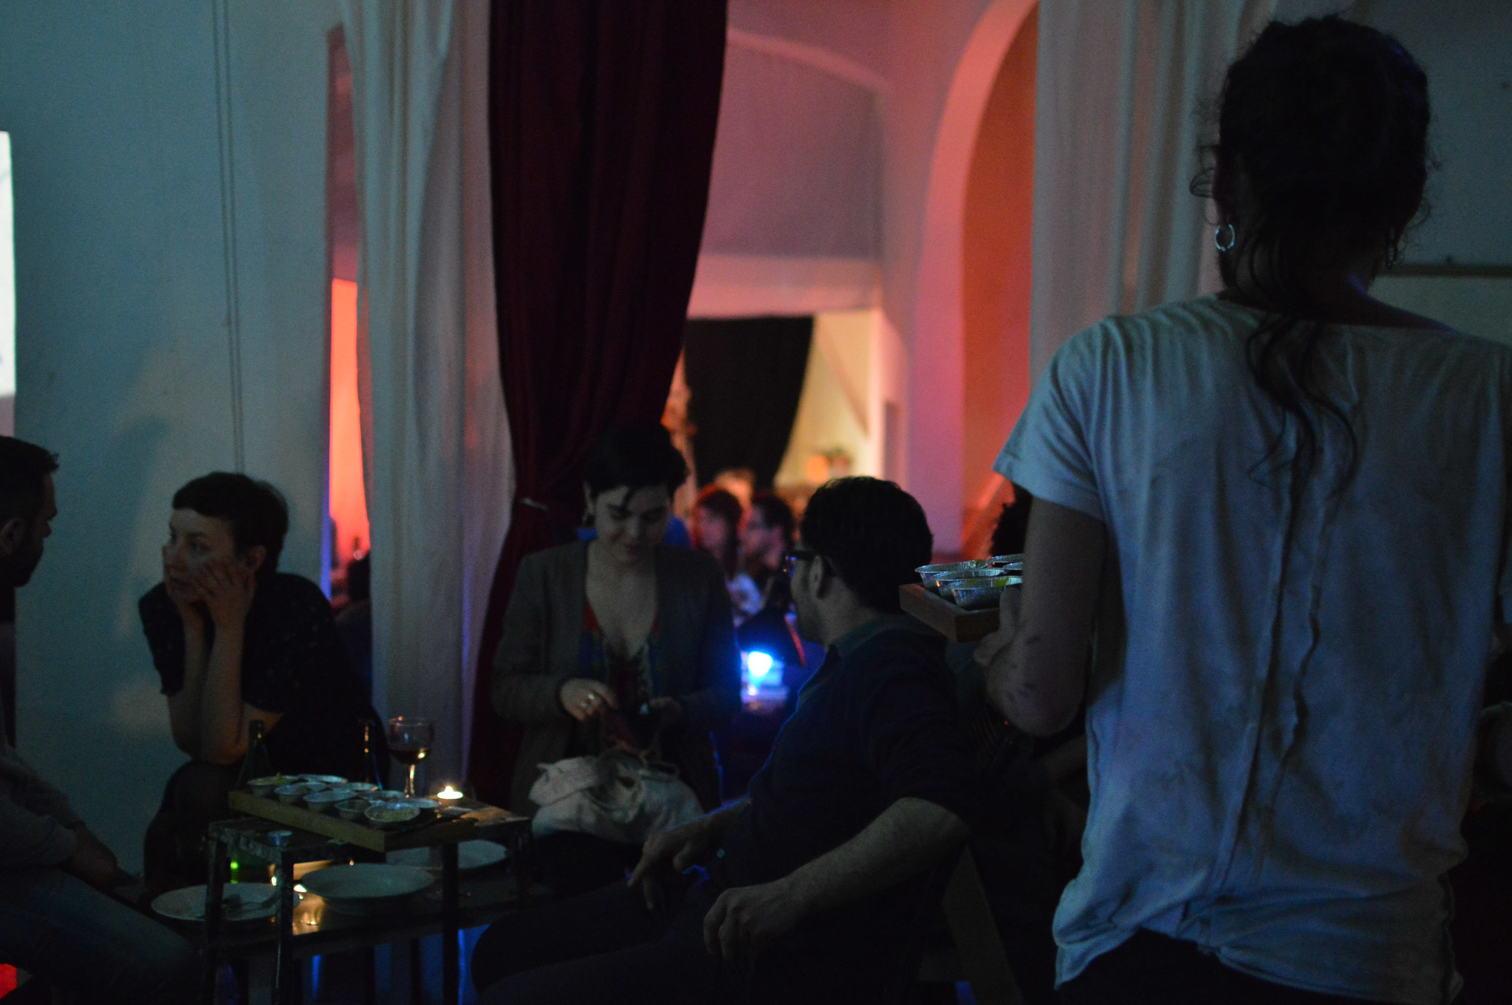 IlGattaRossa - 15 Apr 2015 - I Mangiatori Di Teste - DSC_0392